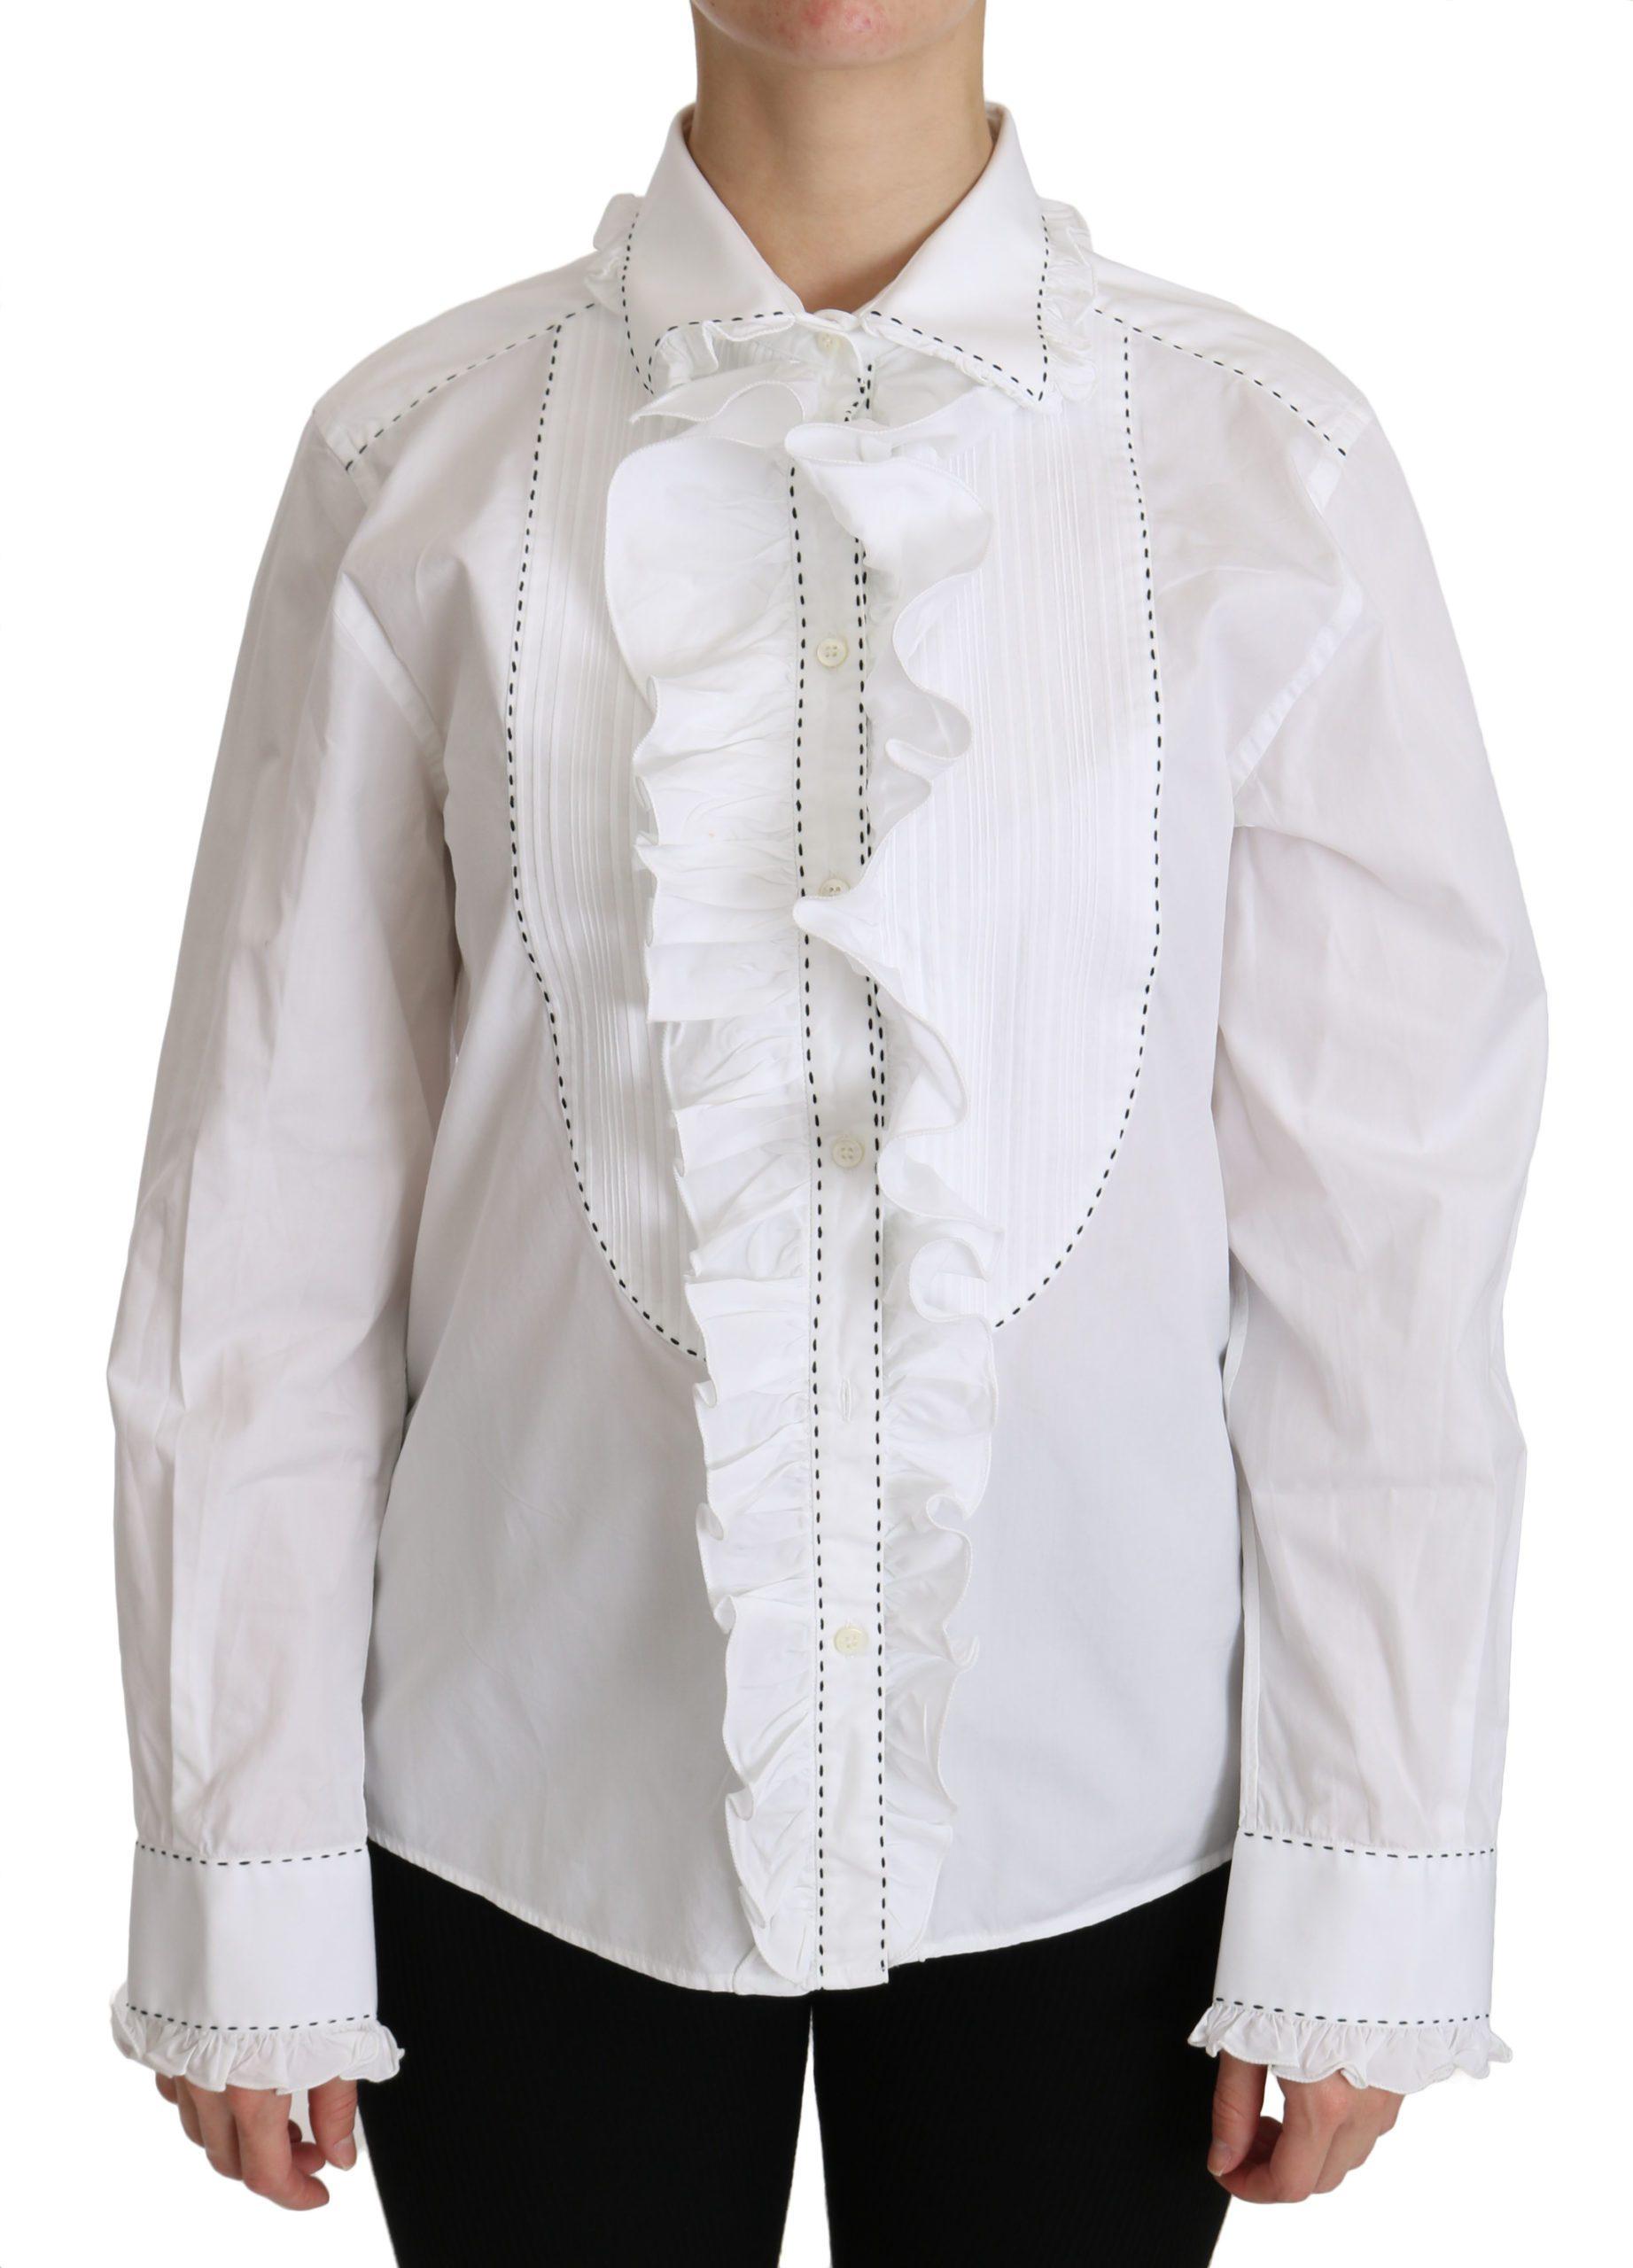 Dolce & Gabbana Women's Ruffle Collared Cotton Shirt White TSH4313 - IT42 M